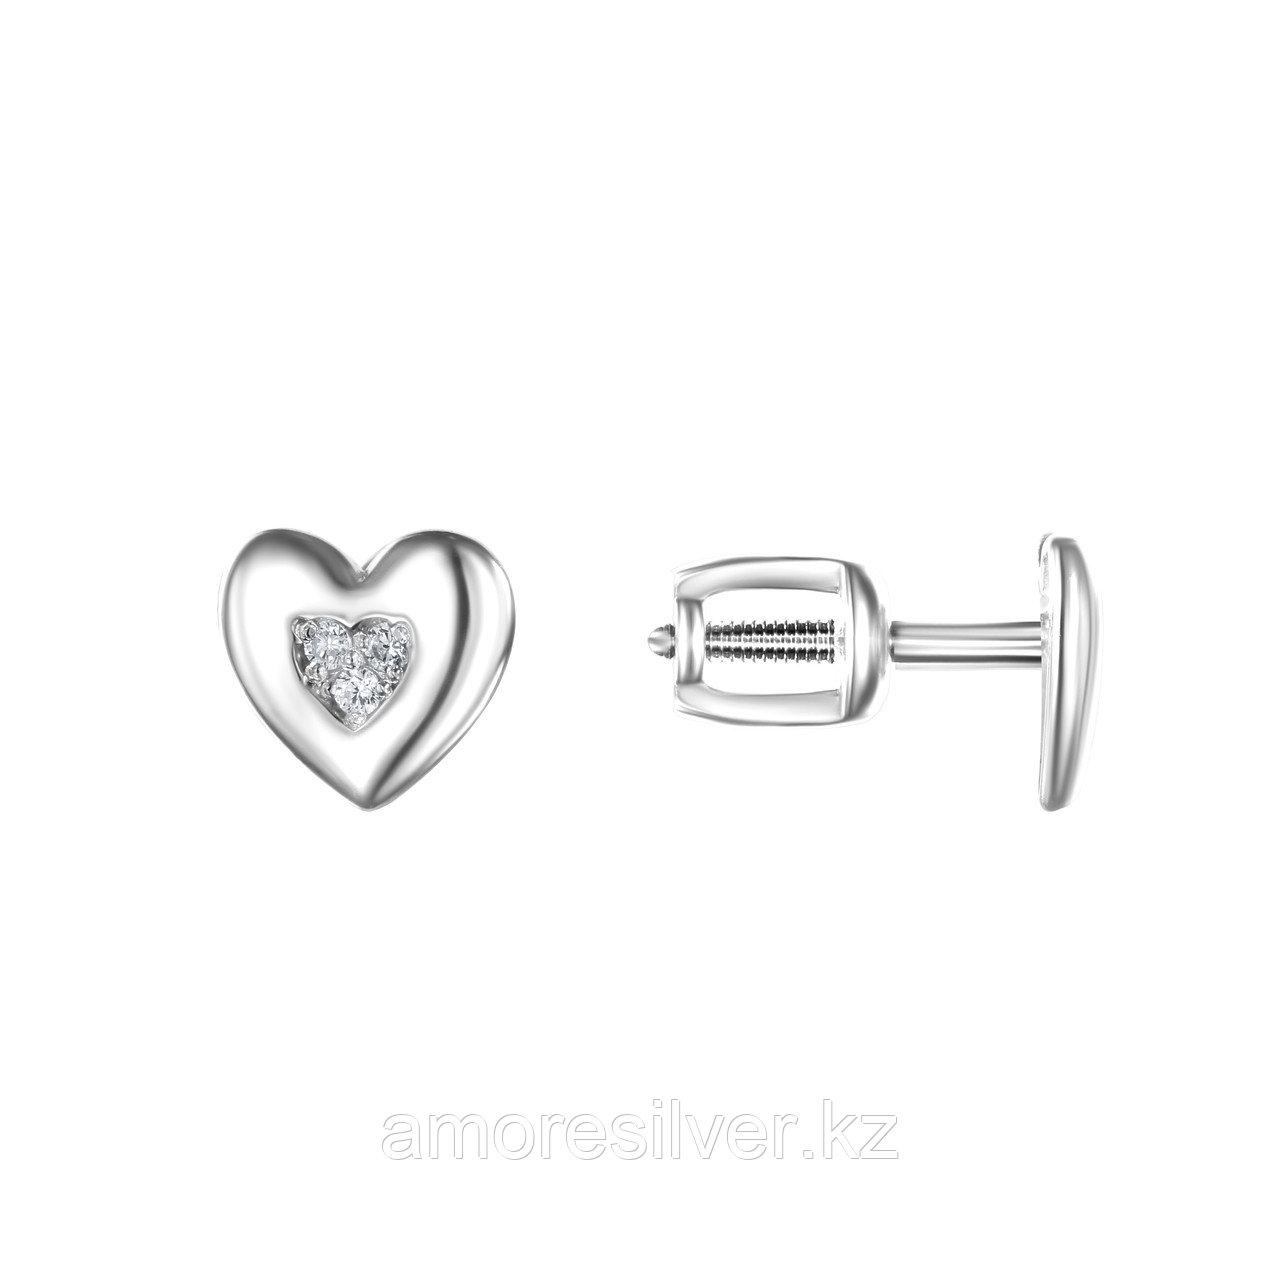 Серьги TEOSA серебро с родием, фианит, love 10219-0623-CZ - фото 1